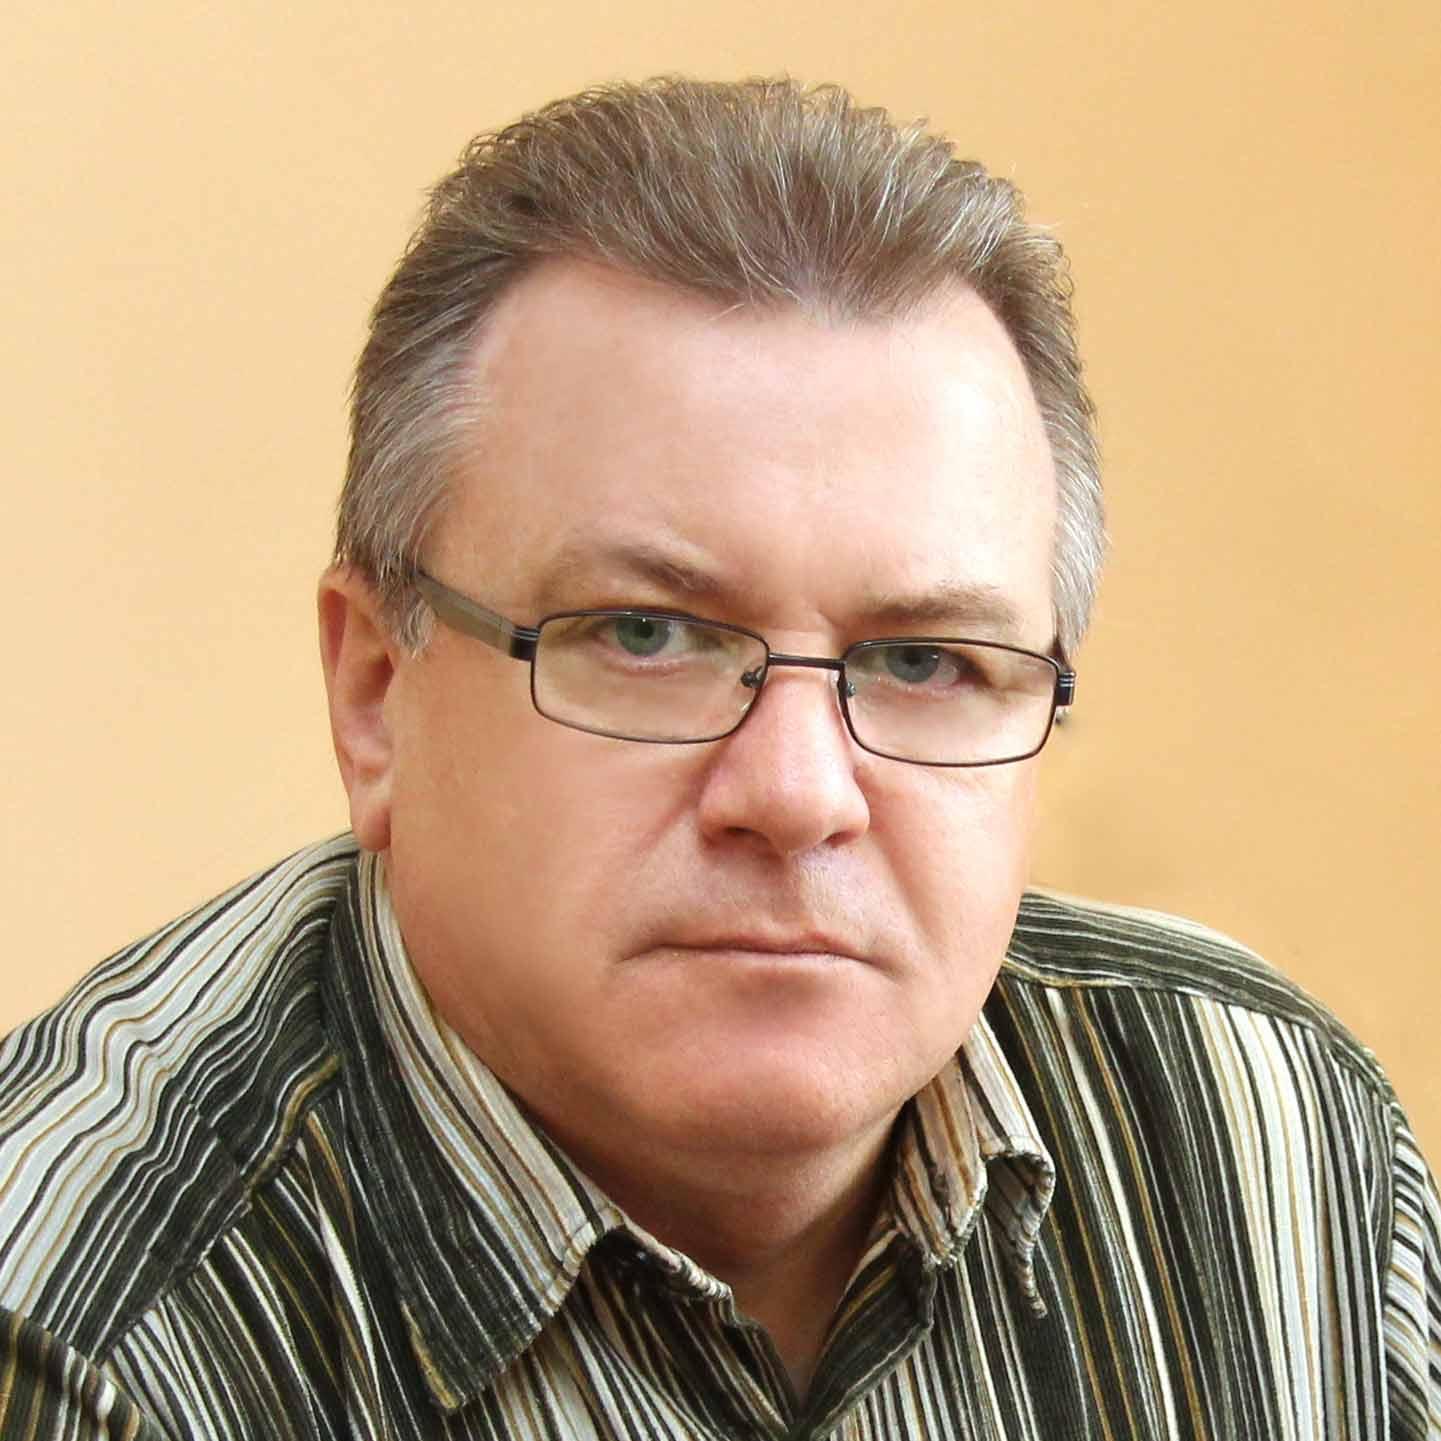 Артюхевич Валентин Алексеевич